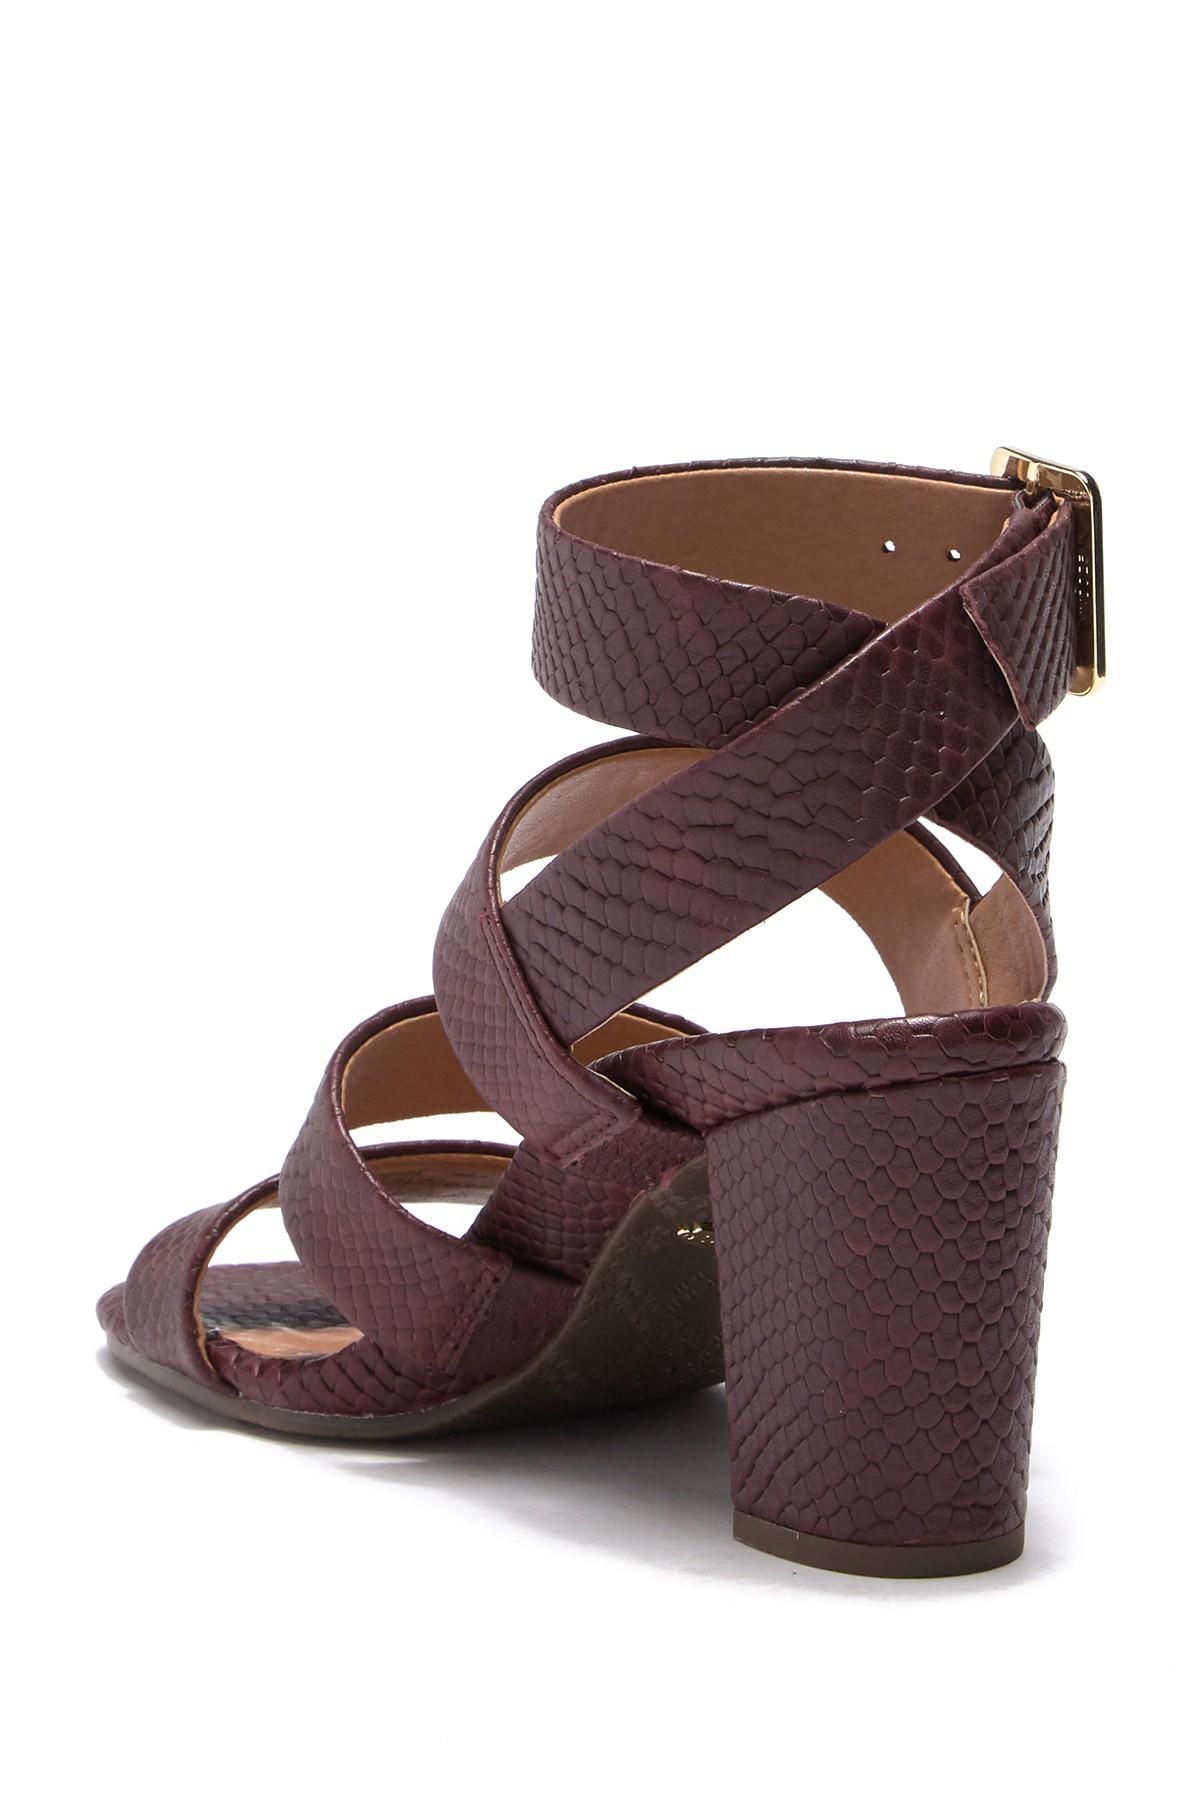 35cbe874bbf0 Vionic - Brown Blaire Block Heel Sandal - Lyst. View fullscreen